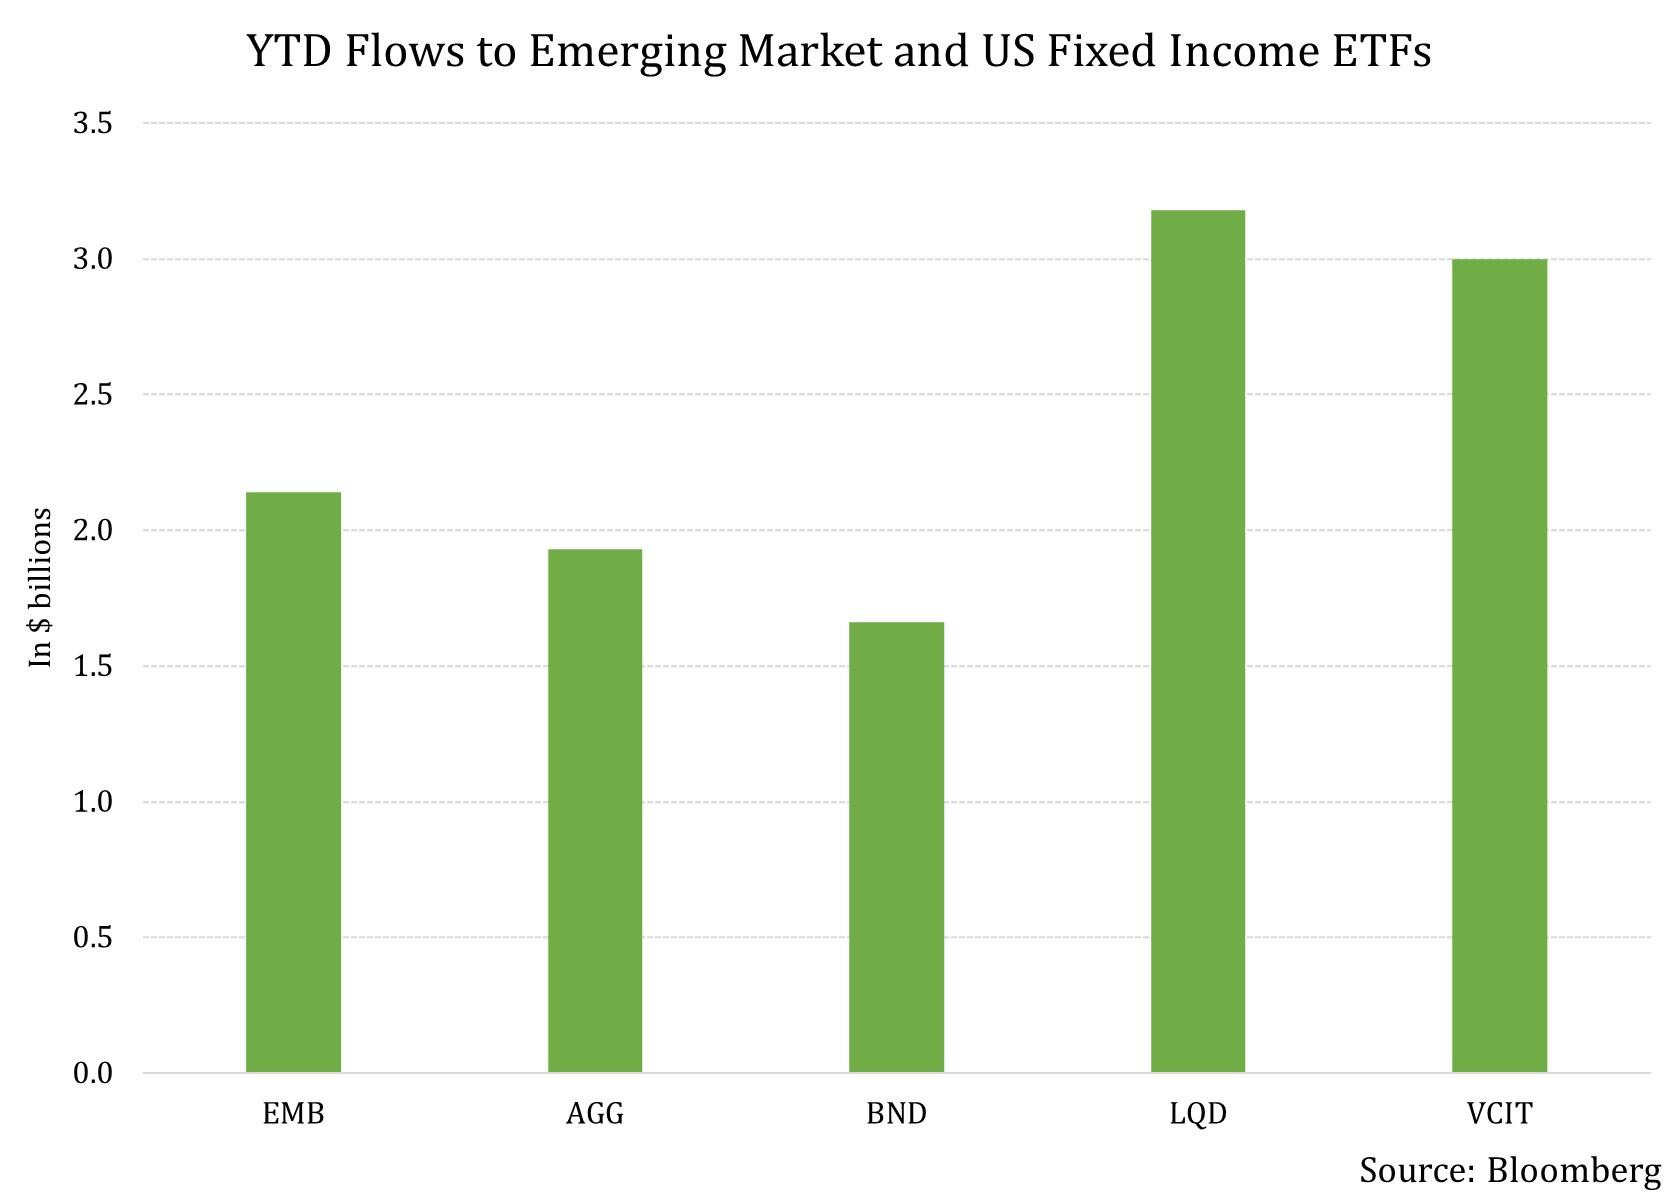 IShares MSCI EAFE Index Fund (EFA) Short Interest Down 19.5% in March